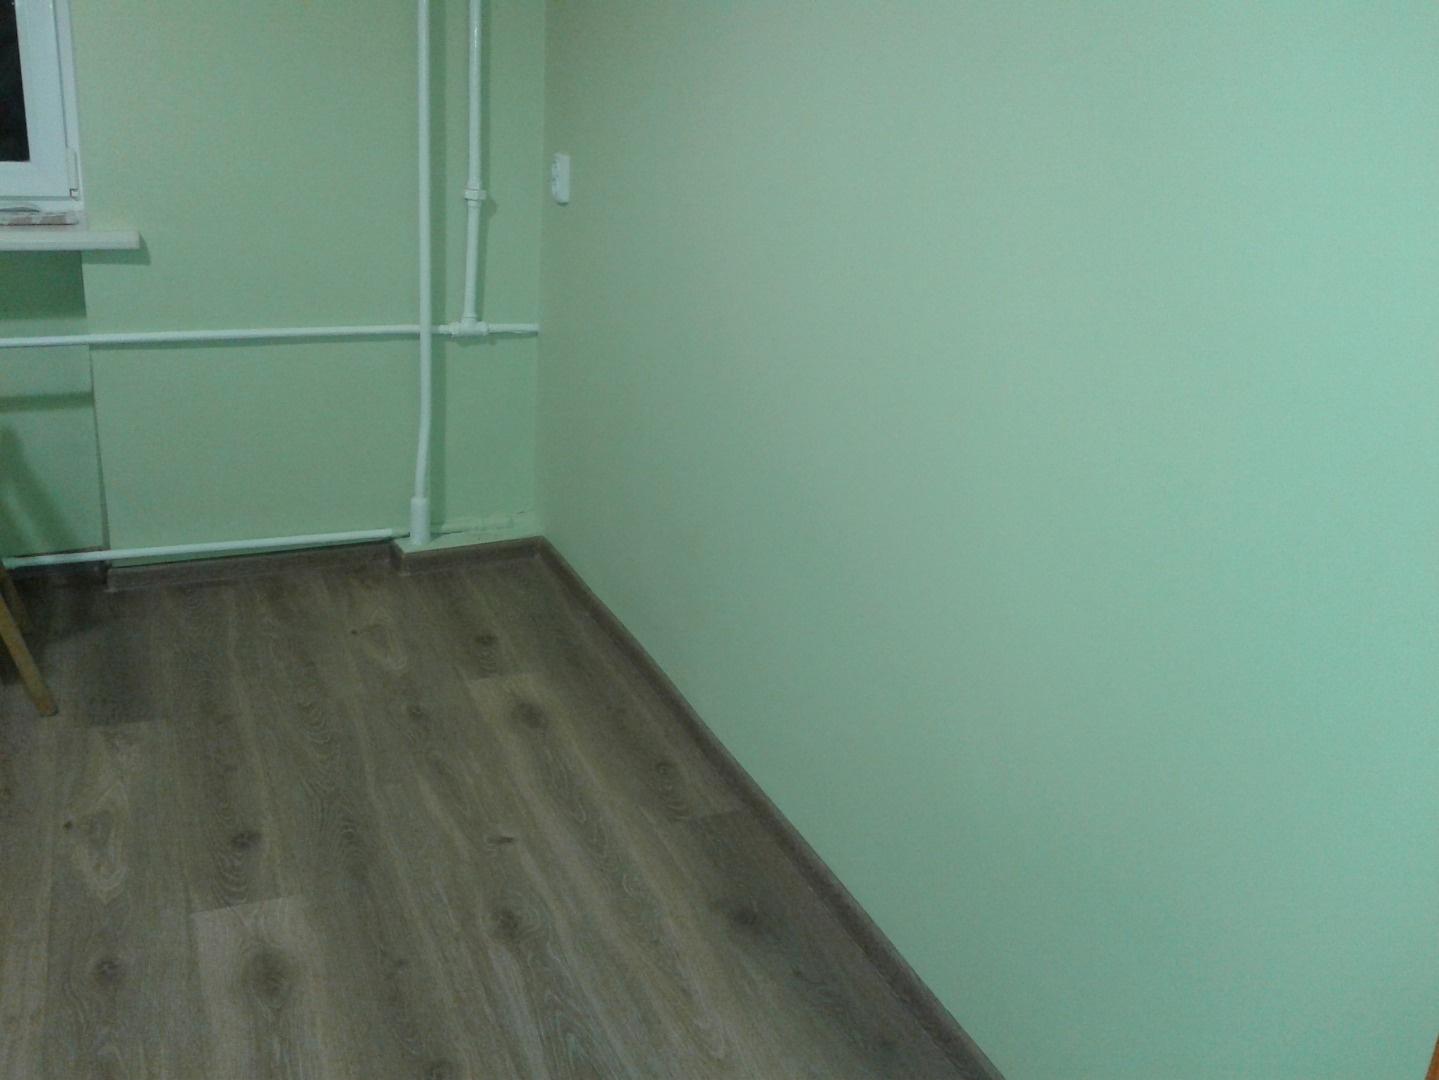 Продается 2-комнатная Квартира на ул. Шевченко Пр. — 90 000 у.е. (фото №14)